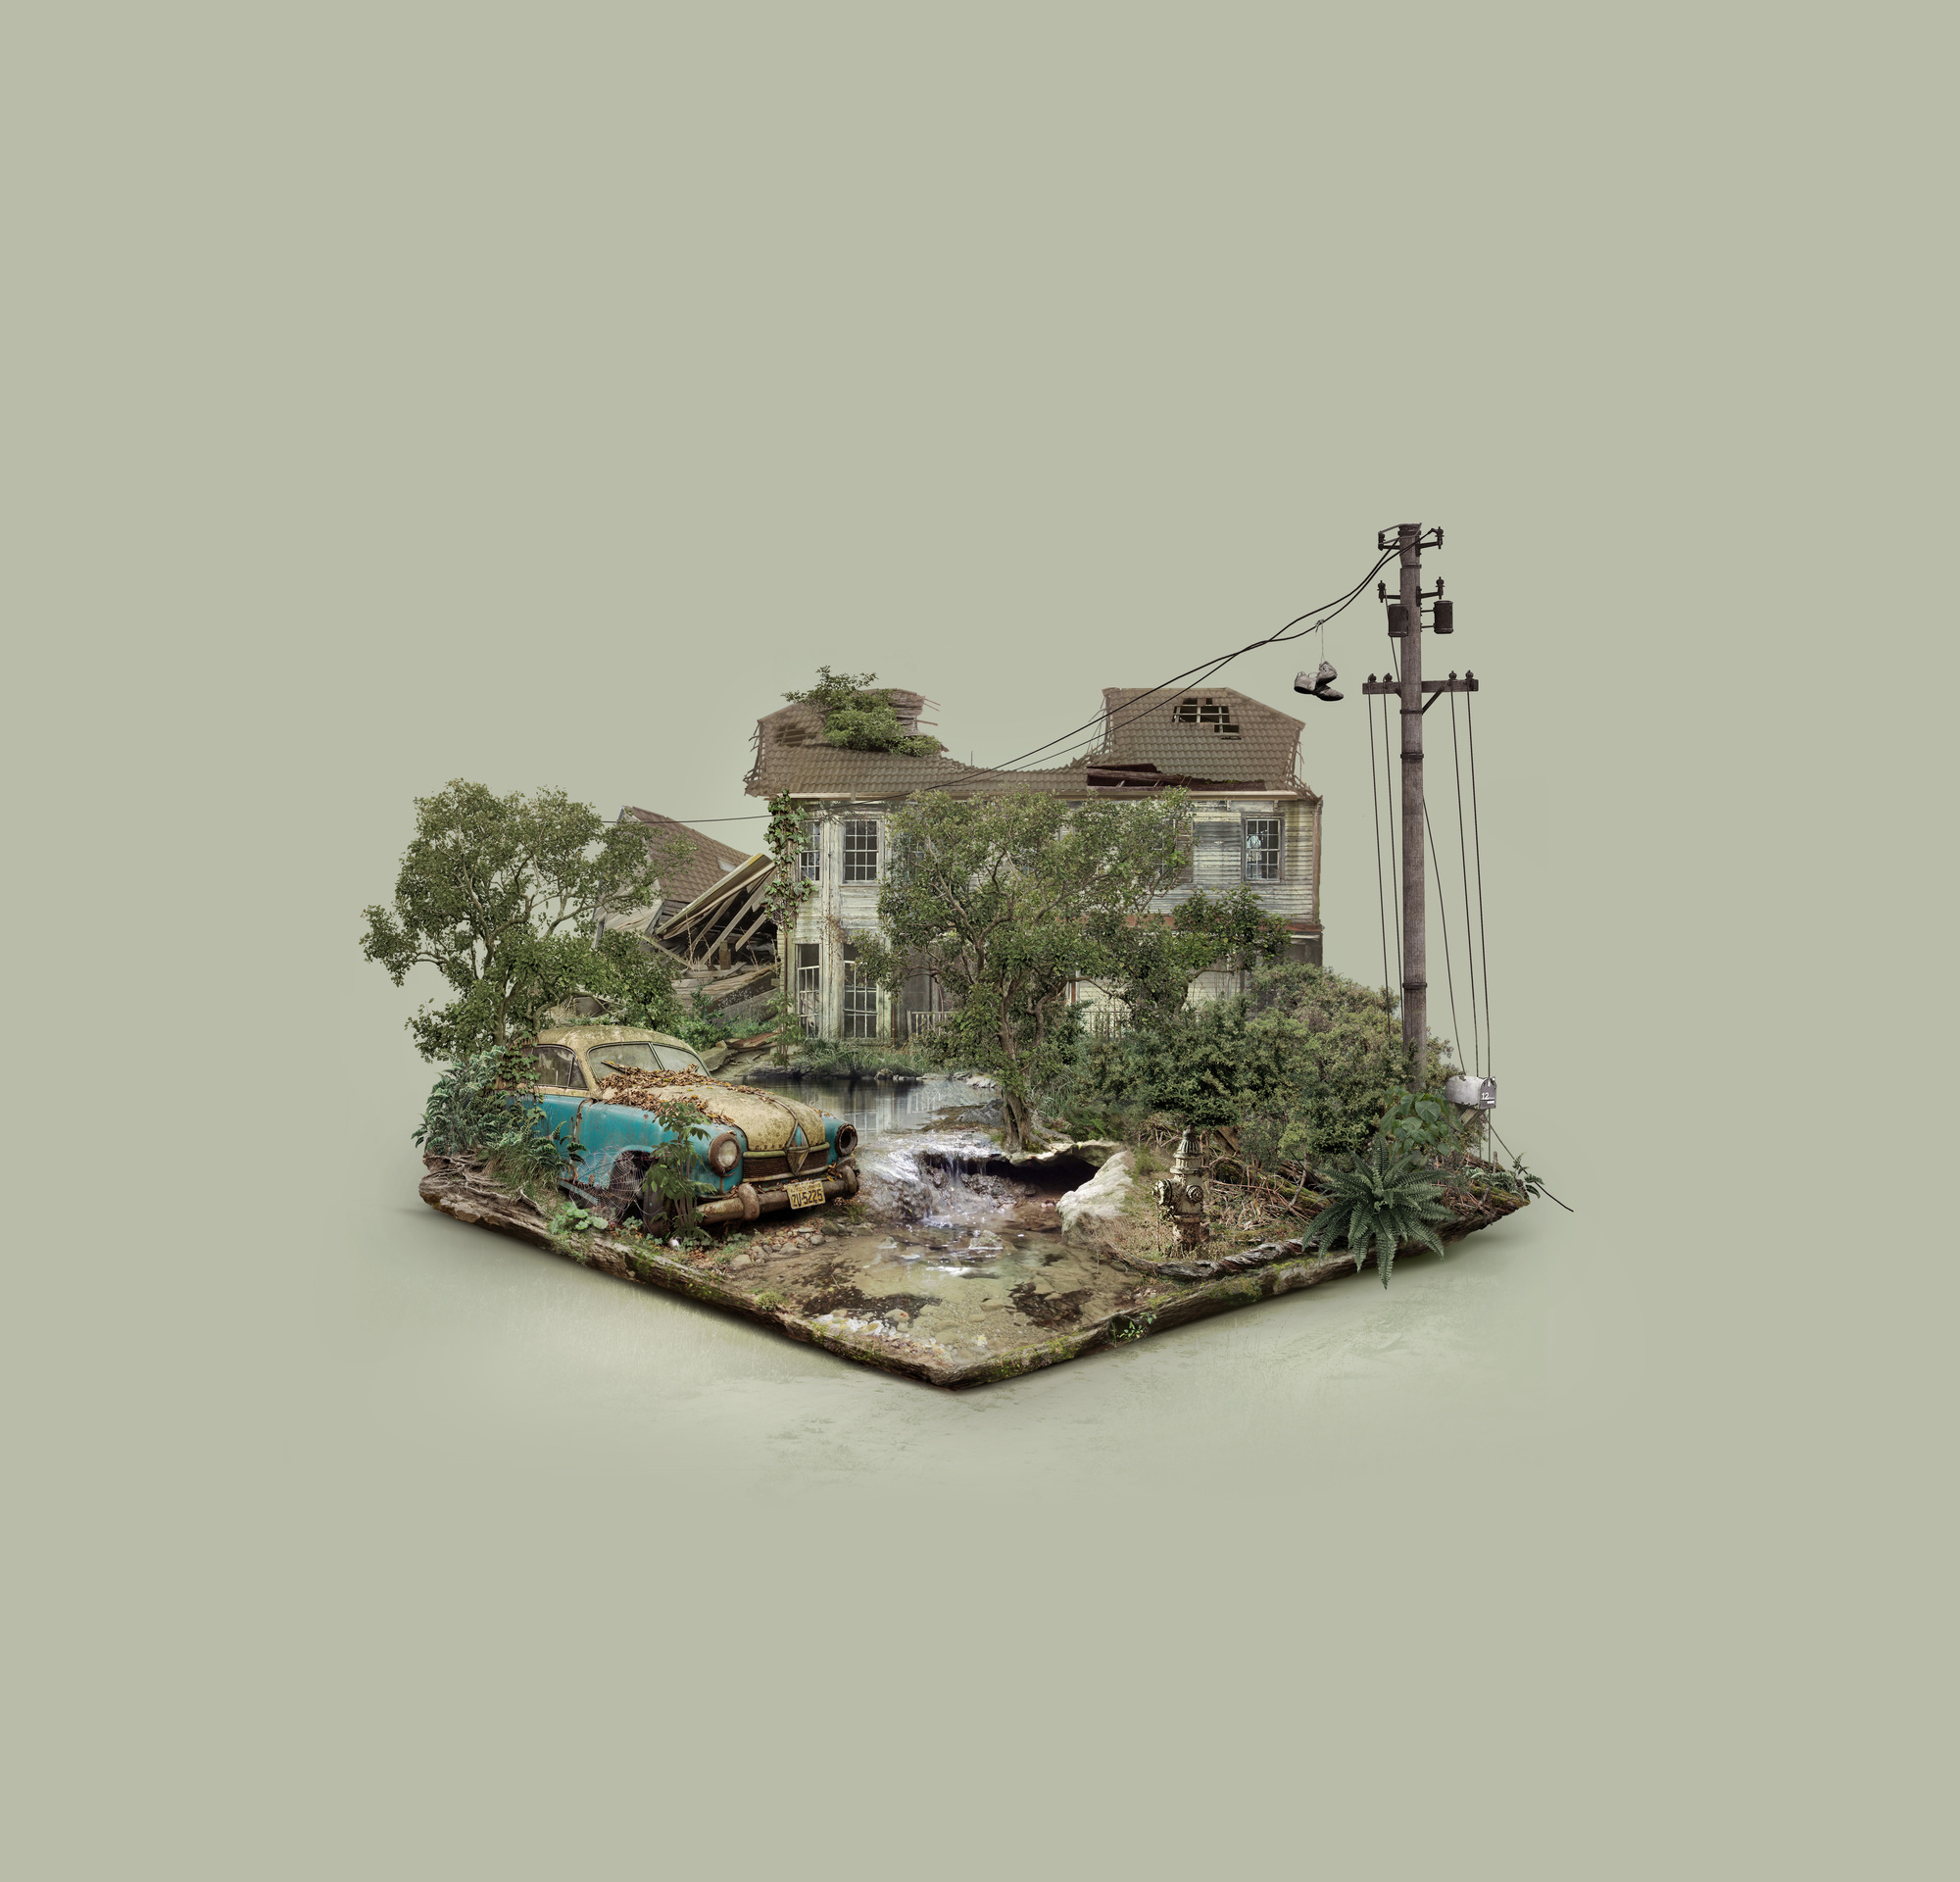 Explore These Digitally-Created Abandoned Islands by Brazilian Designer Fabio Araujo